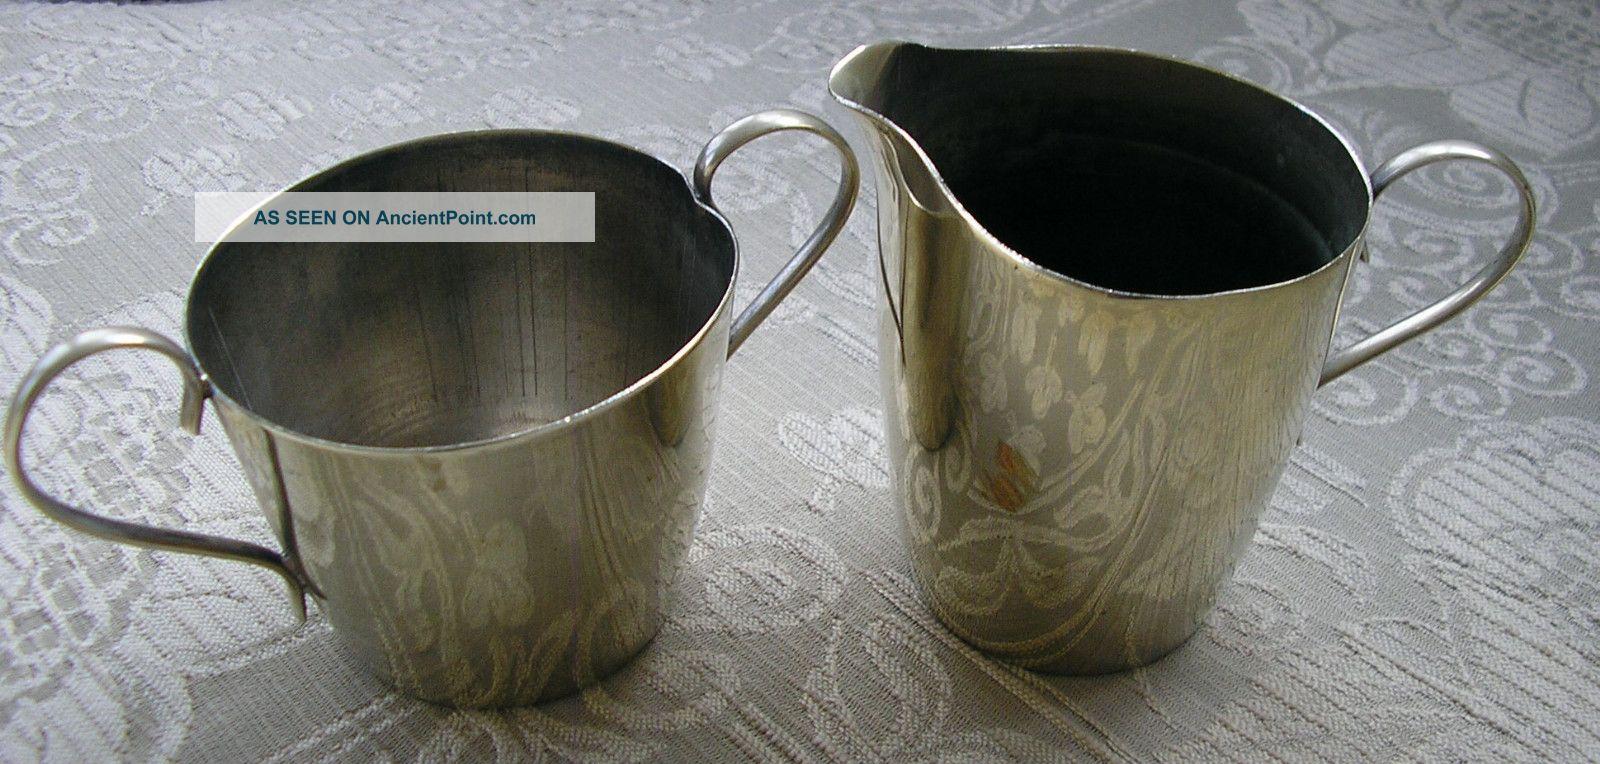 Pretty Vintage Silver Plated Epns Small Size Sugar Bowl & Milk Jug Sugar Bowls/ Tongs photo